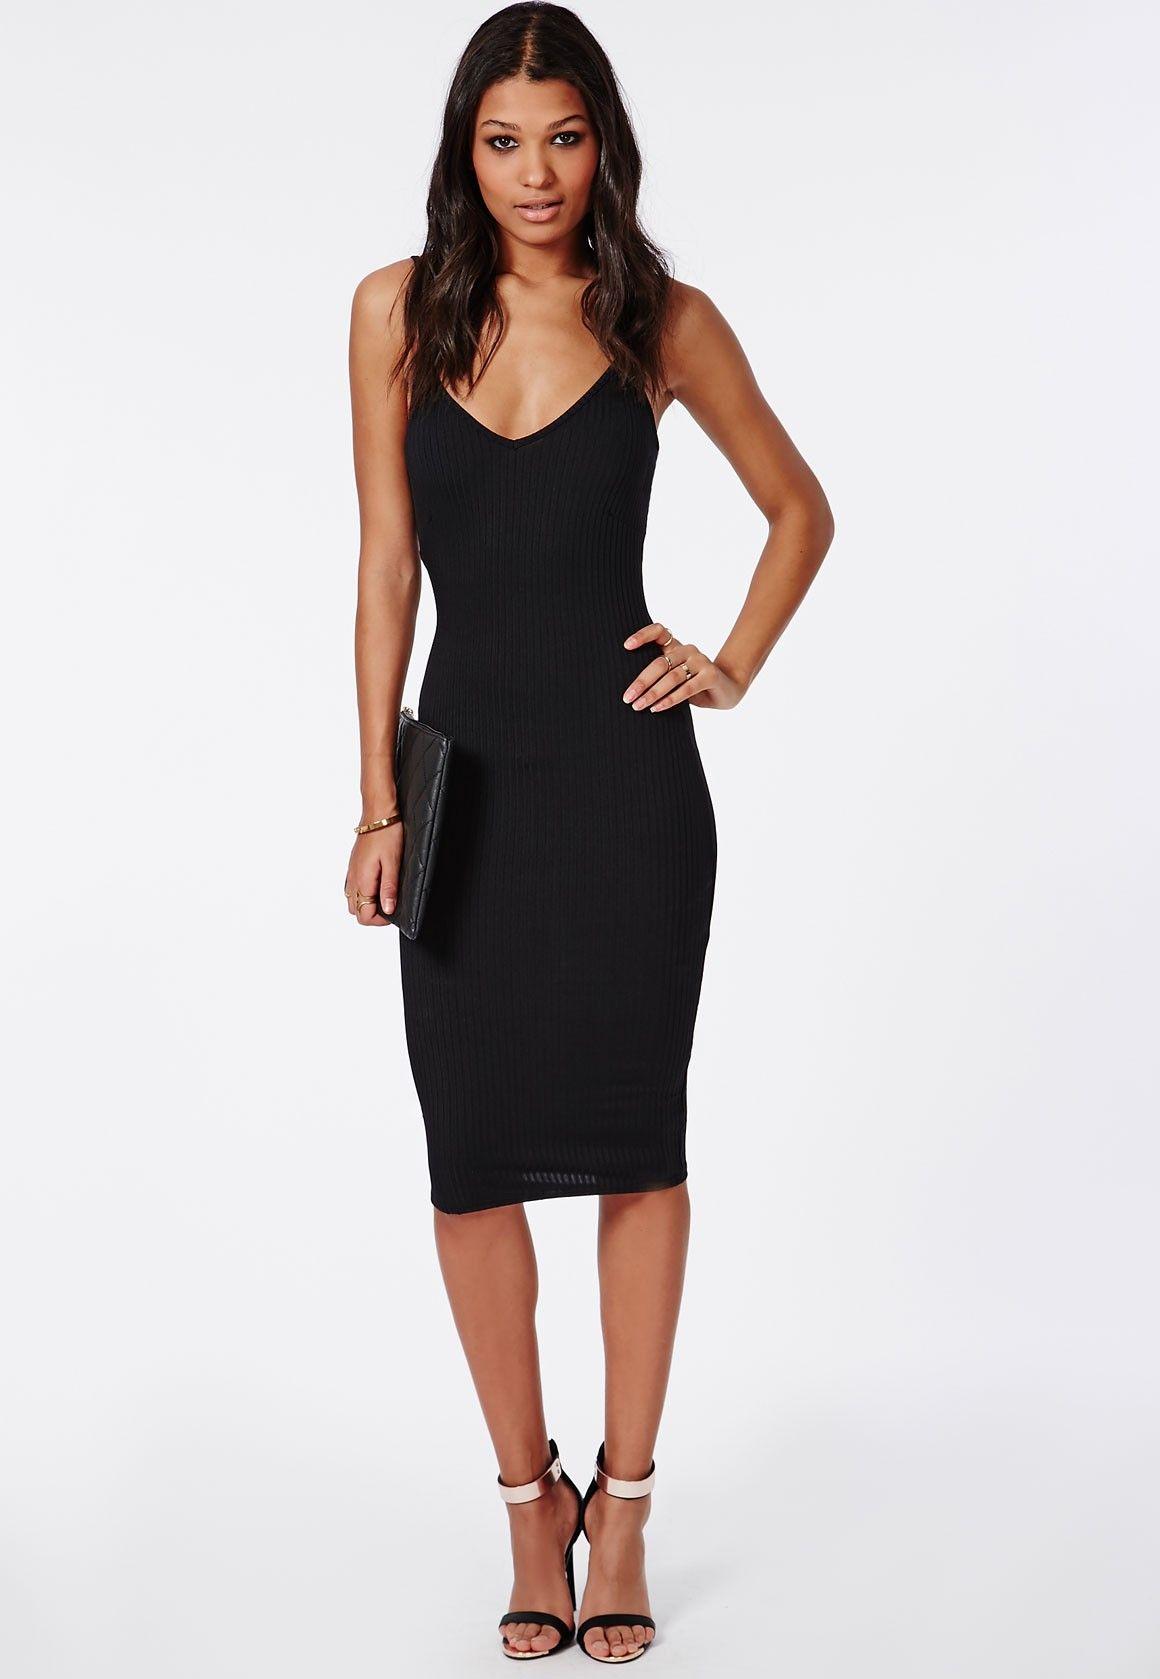 Ribbed Strappy Bodycon Midi Dress Black - Dresses - Midi Dresses ...